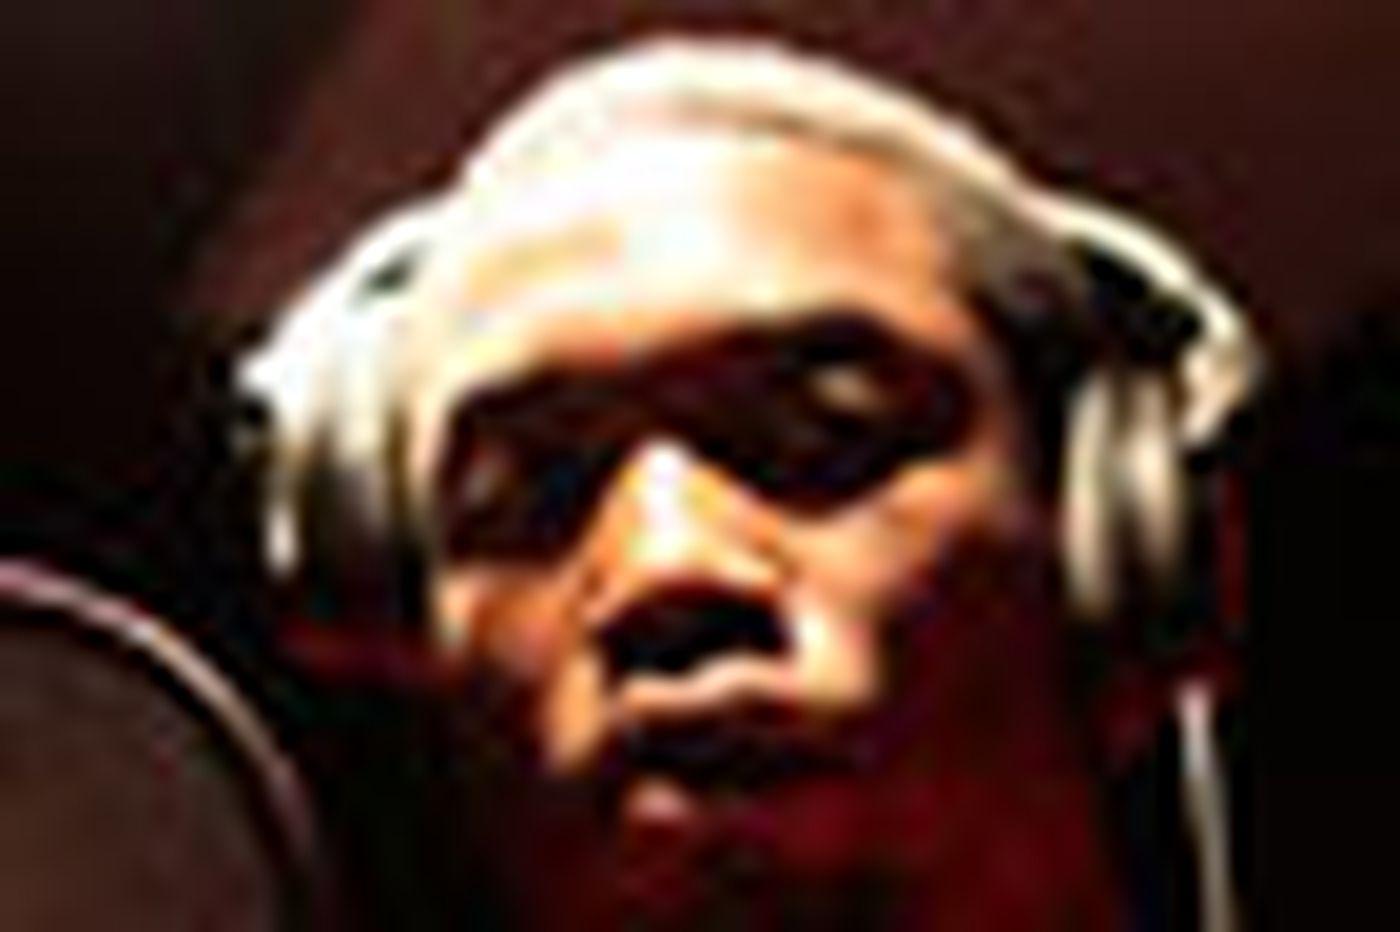 Judge grounds rapper Meek Mill